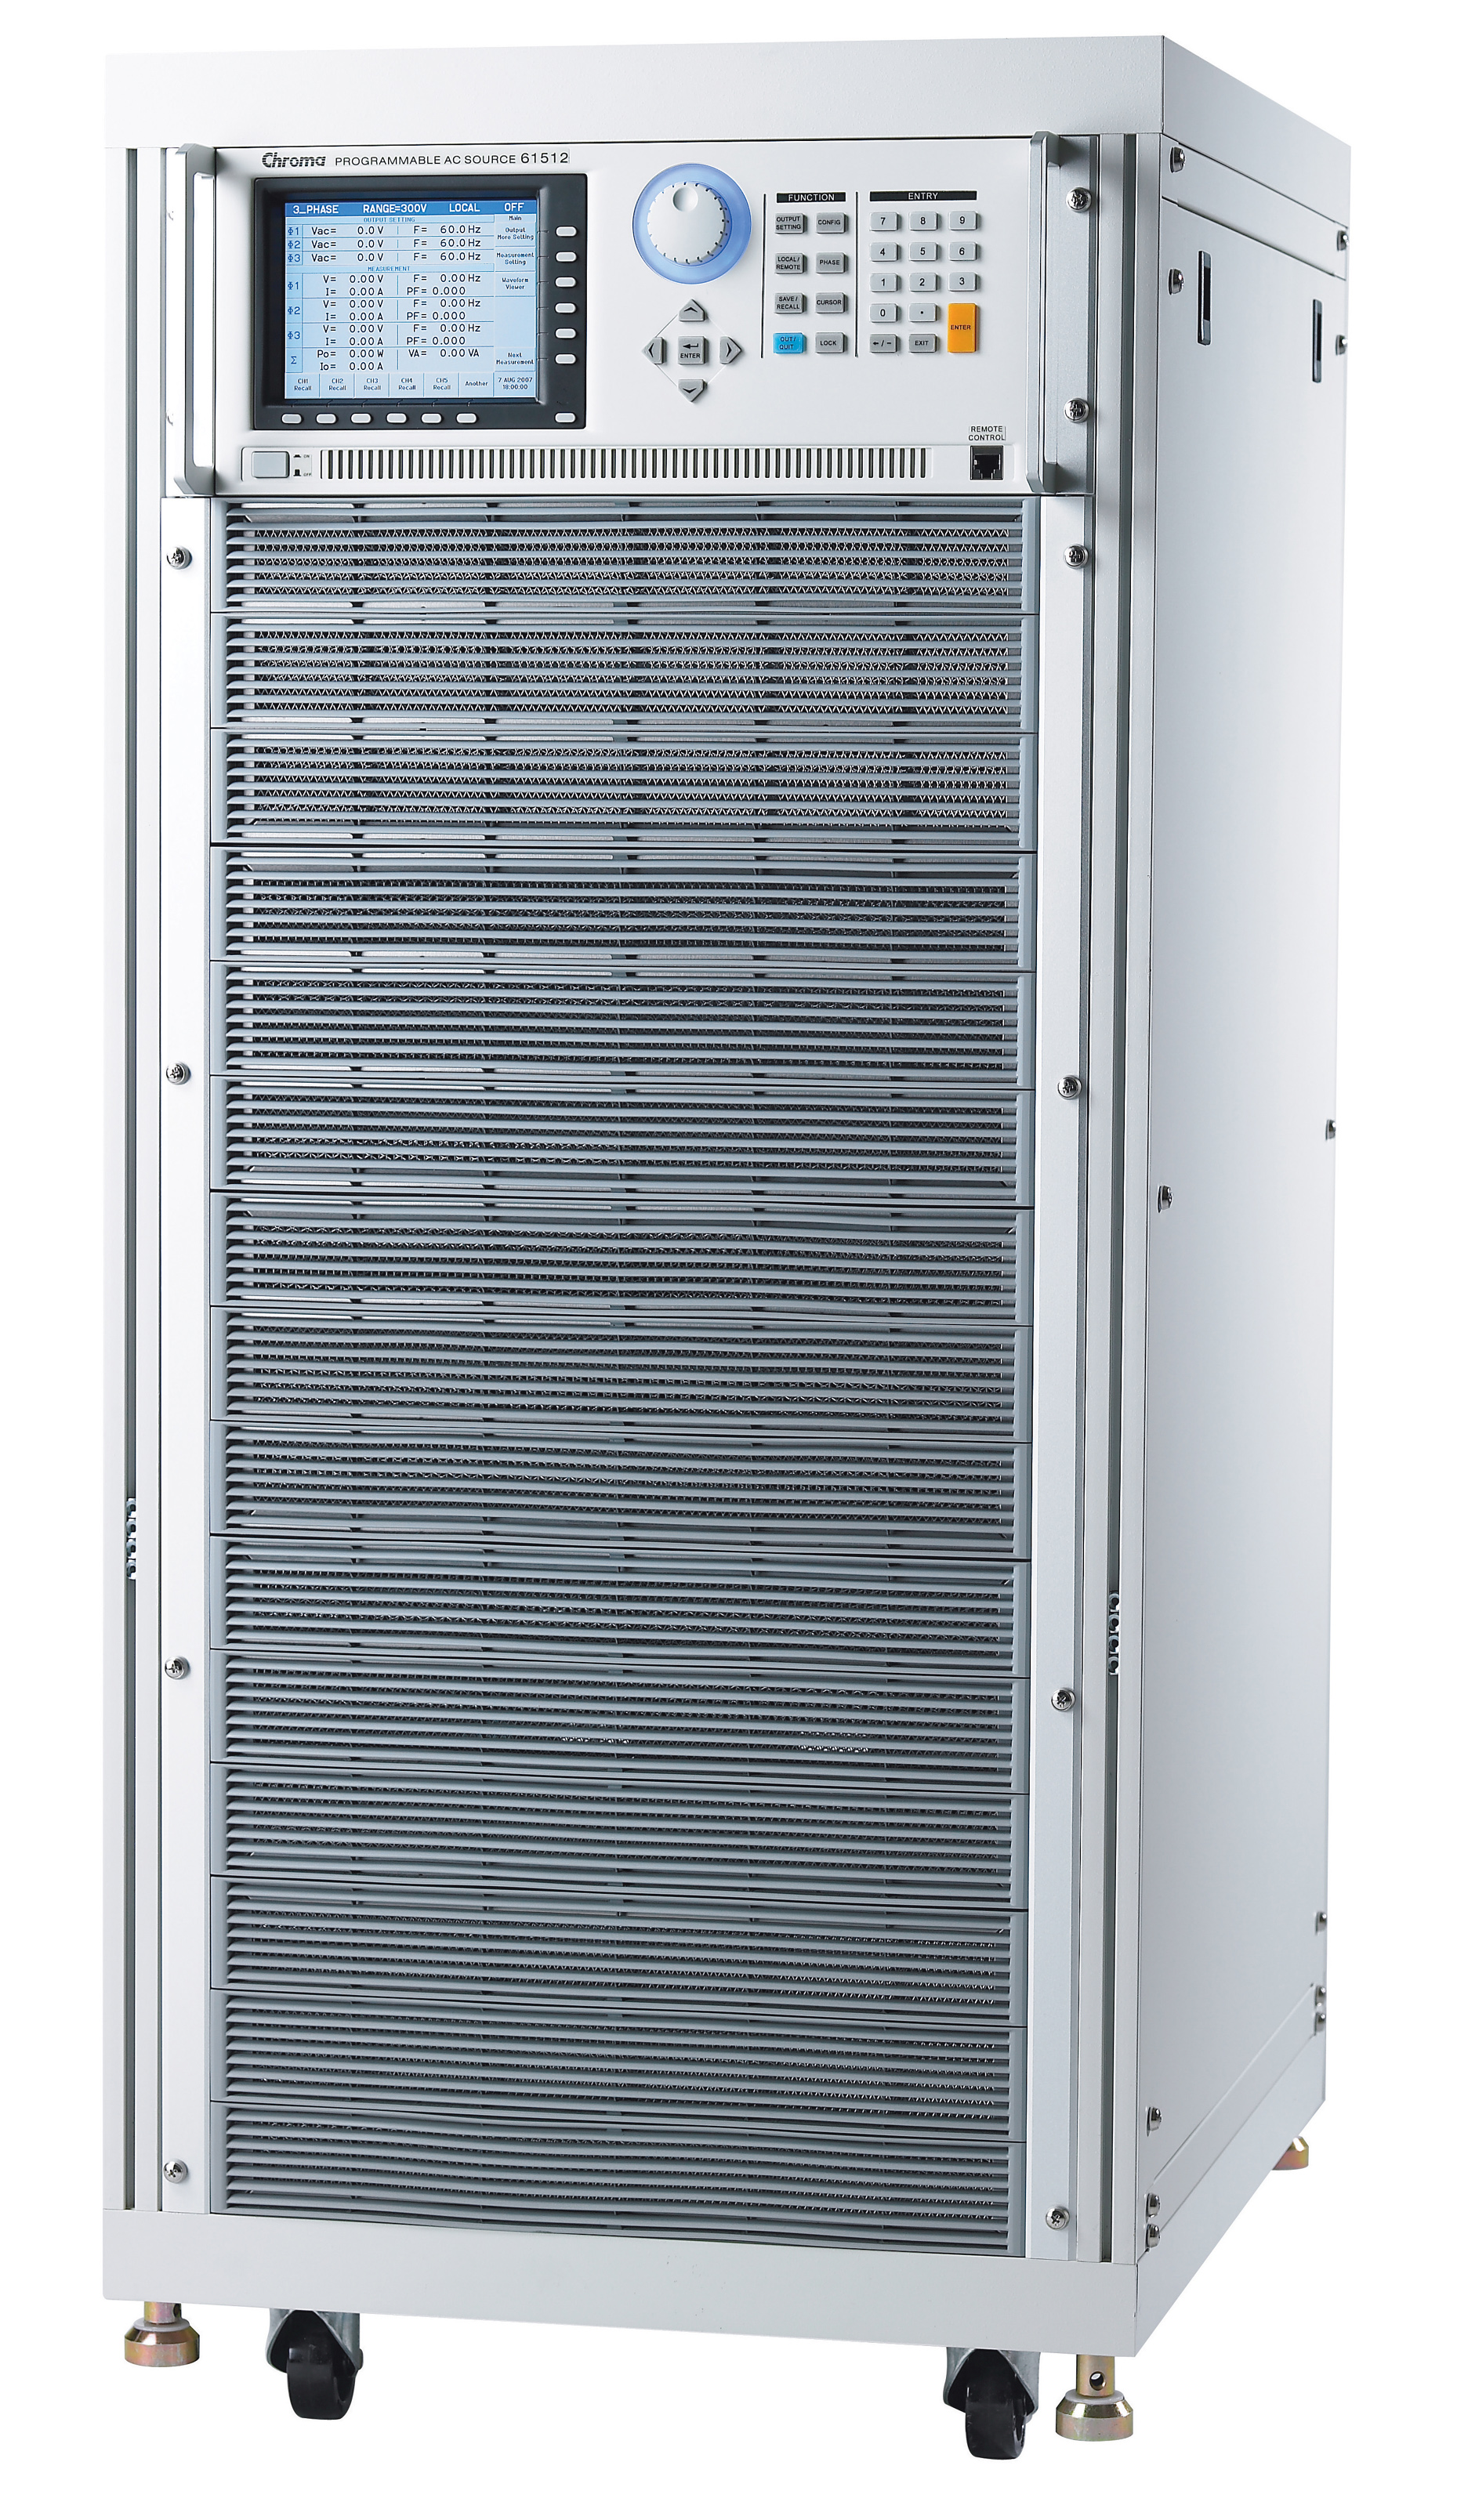 Chroma 61500 Series three-phase AC power supplies